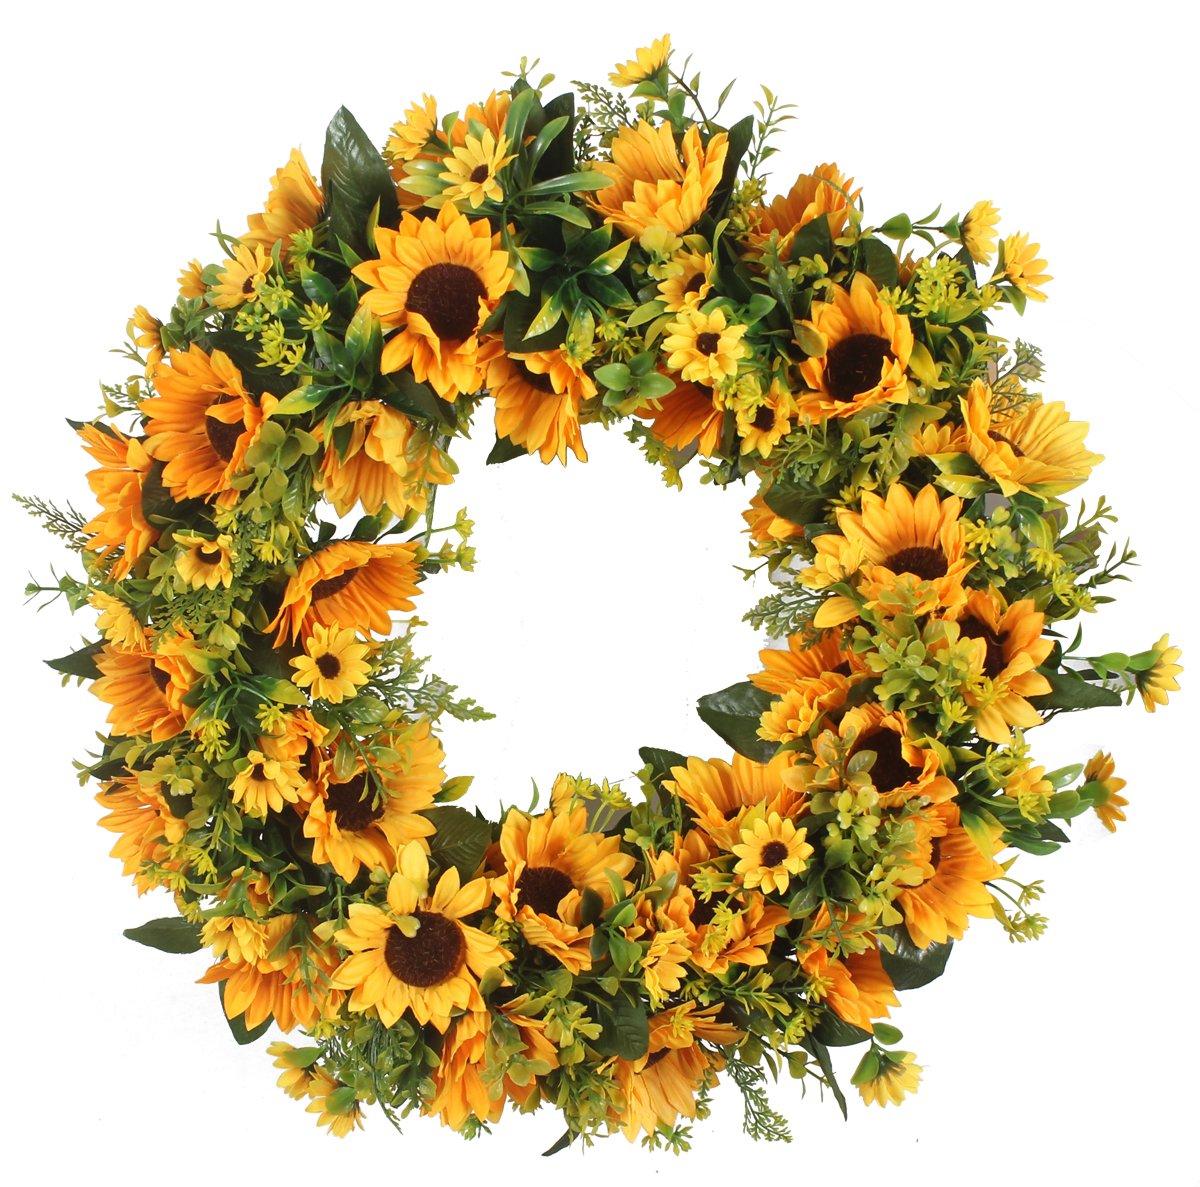 Duovlo 20 Inch Sunflowers Flowers Greenery Wreath Summer Fall Celebrate Handcrafted Door Wreath Wildflowers Decoration